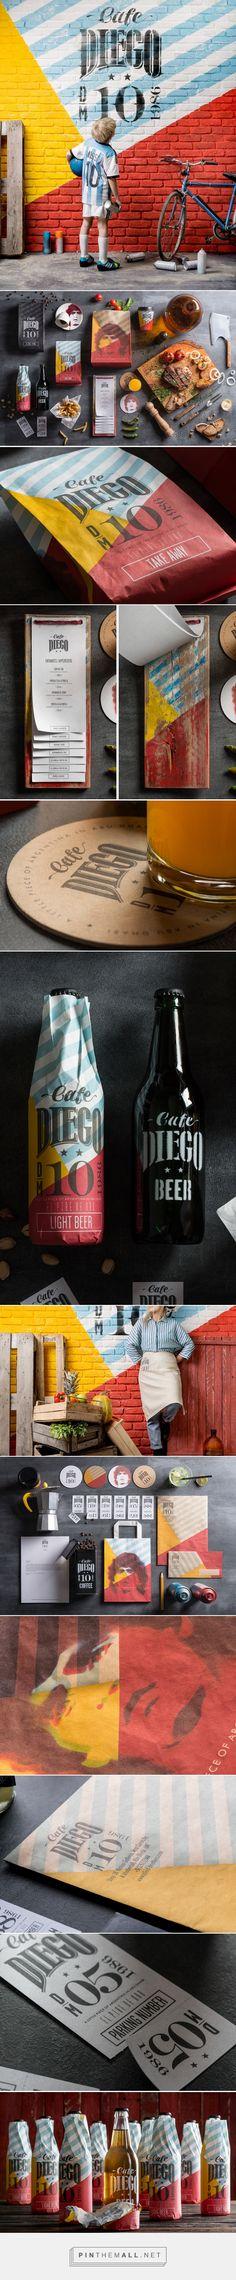 Cafe Diego Branding on Behance | Fivestar Branding – Design and Branding Agency & Inspiration Gallery